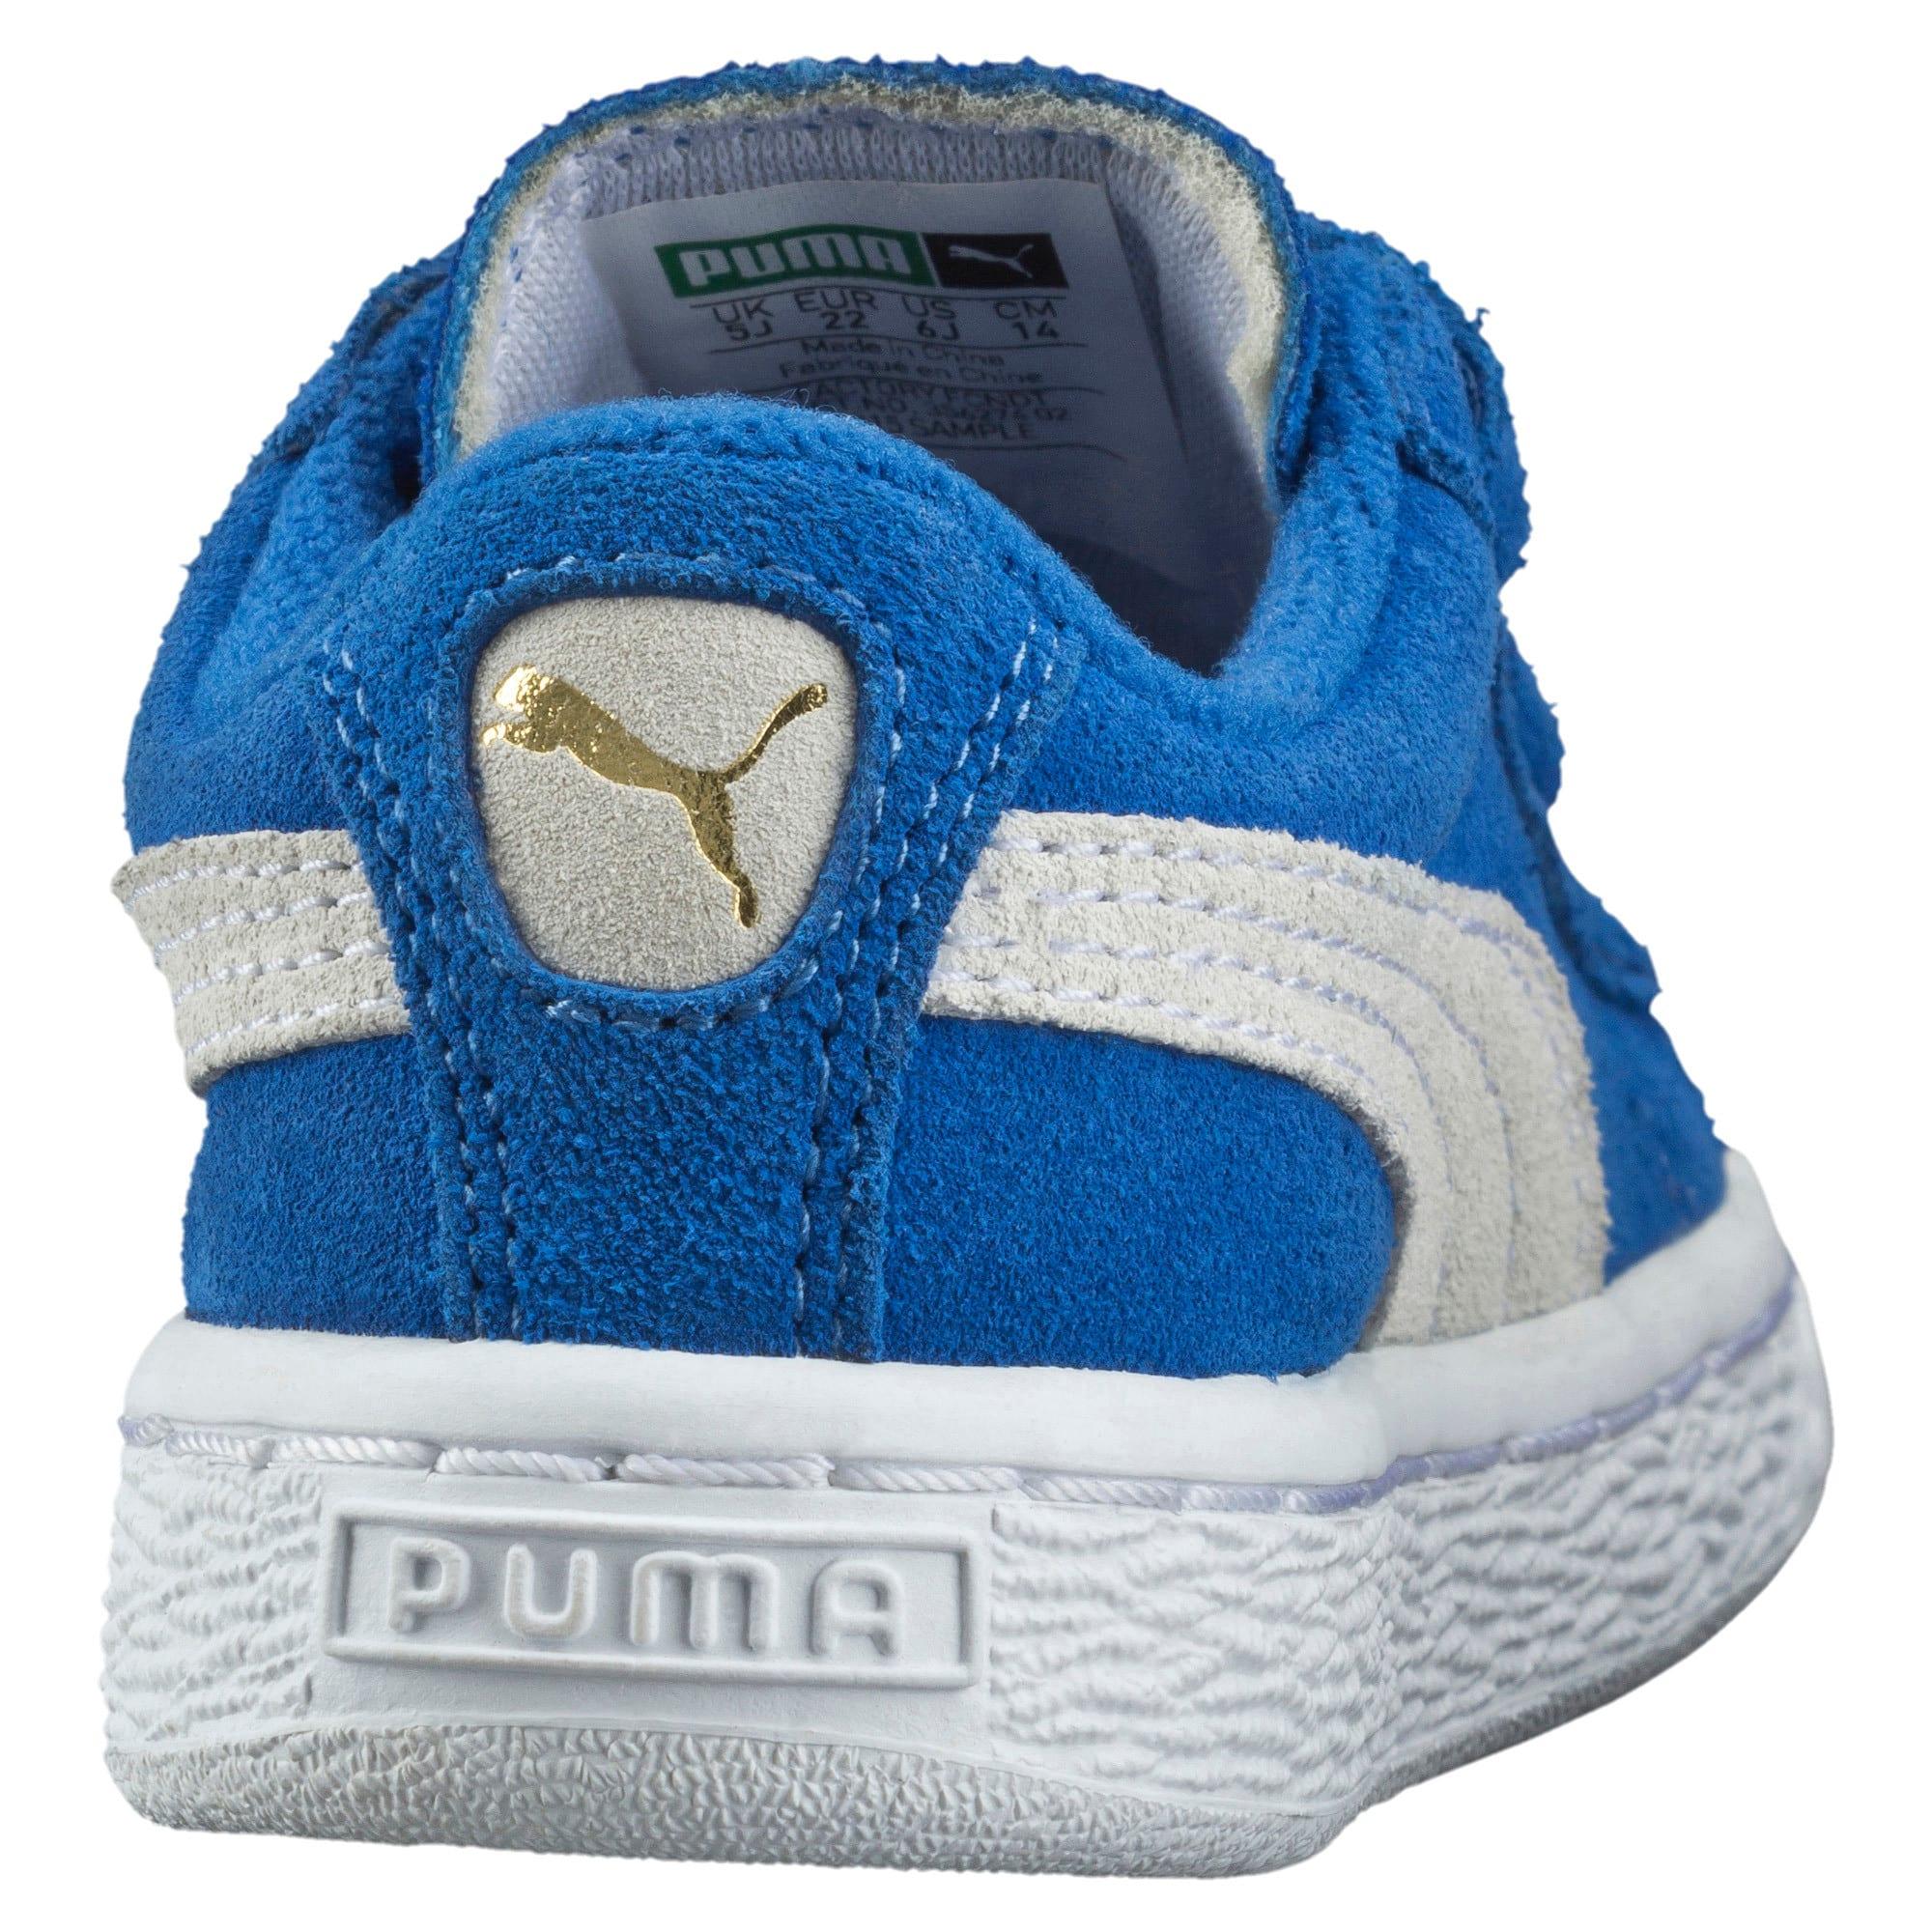 Thumbnail 3 of キッズ スウェード 2ストラップ PS スニーカー 17-21CM, Snorkel Blue-Puma White, medium-JPN